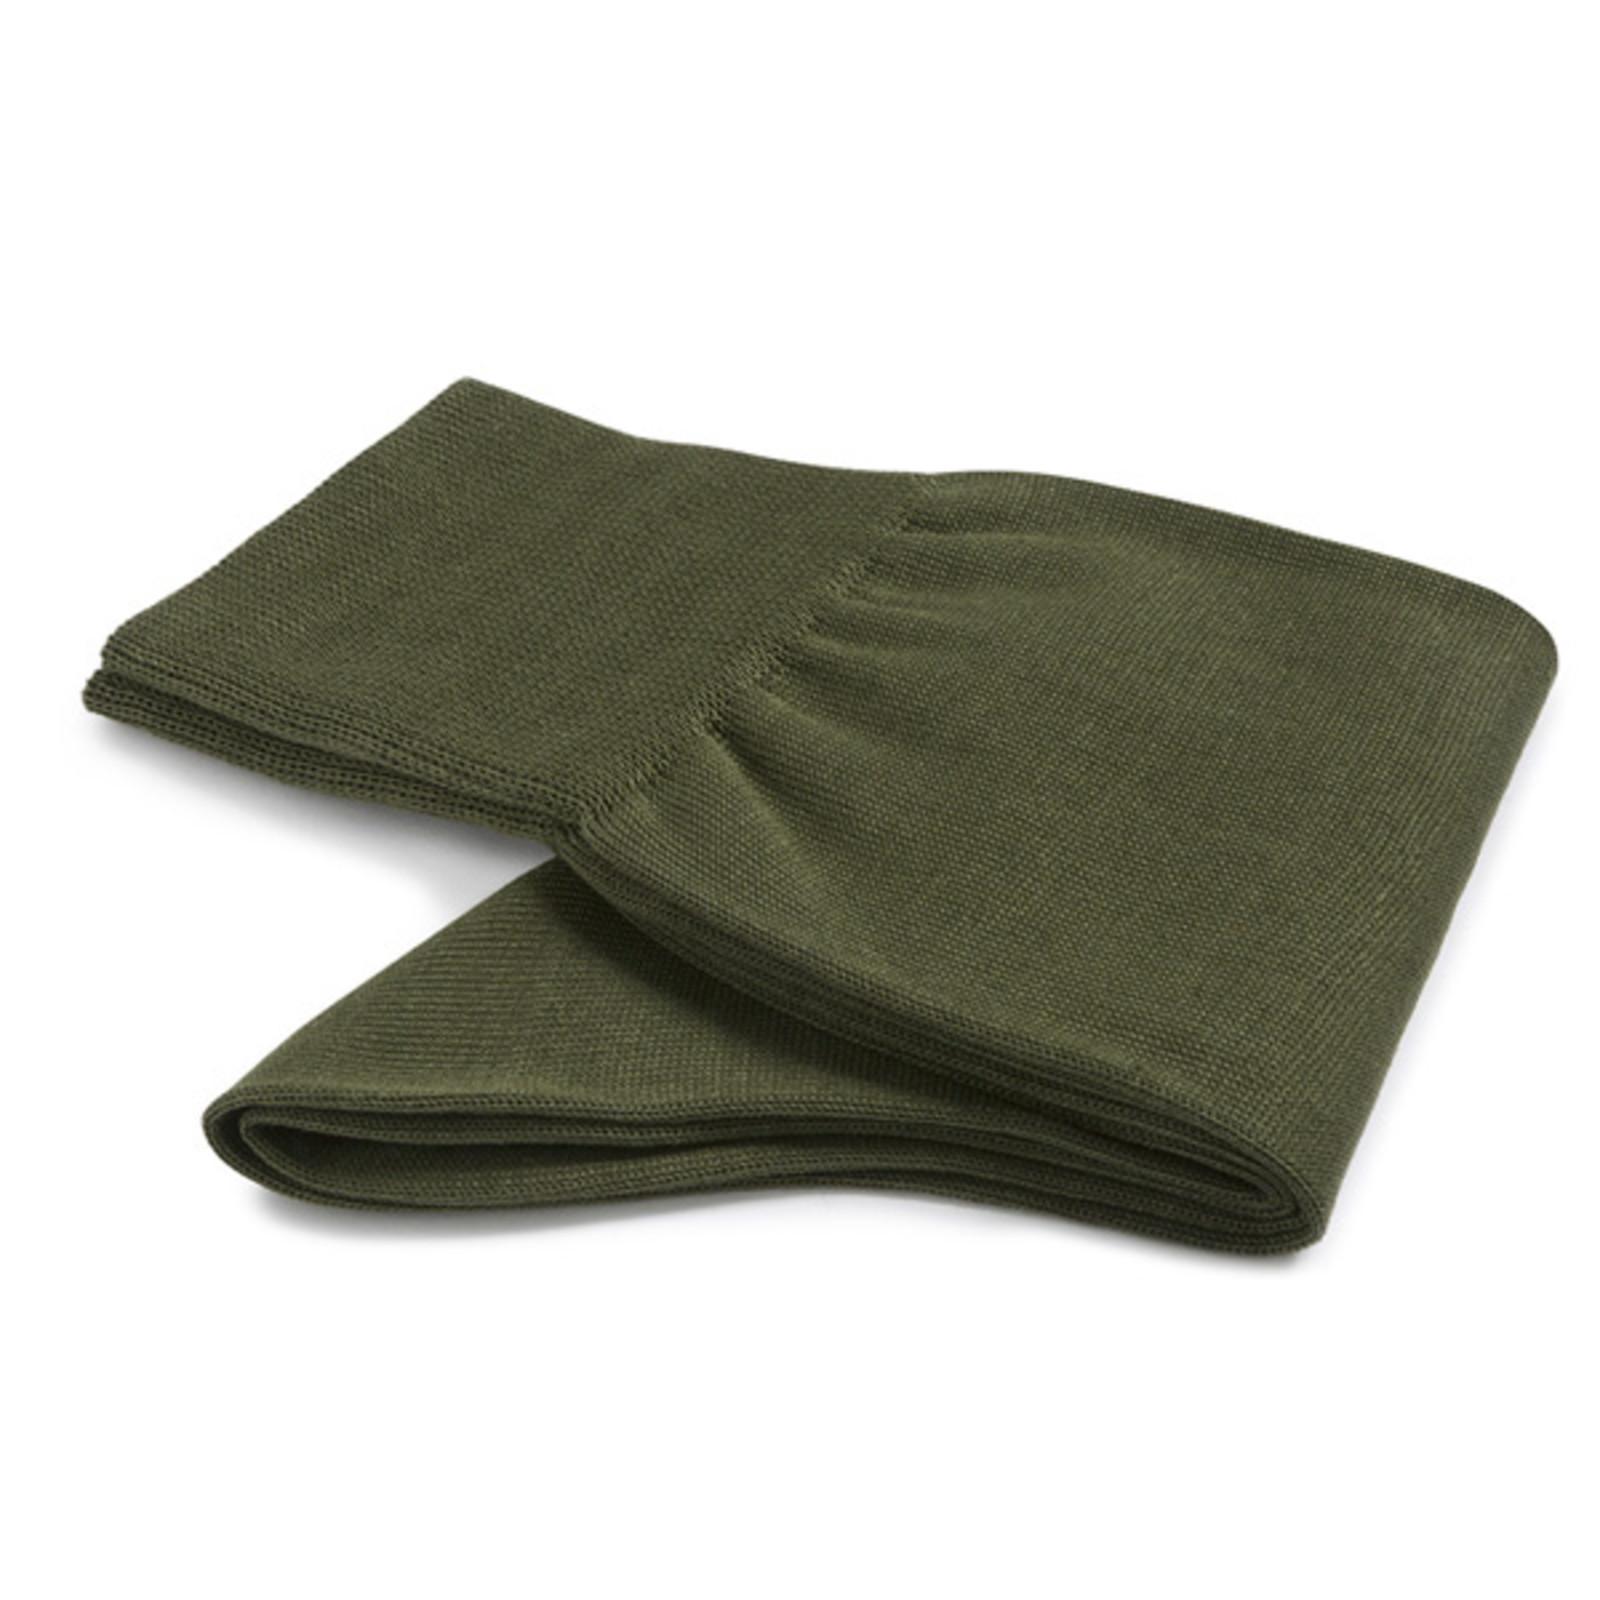 Carlo Lanza Olivgrünen Socken Baumwolle